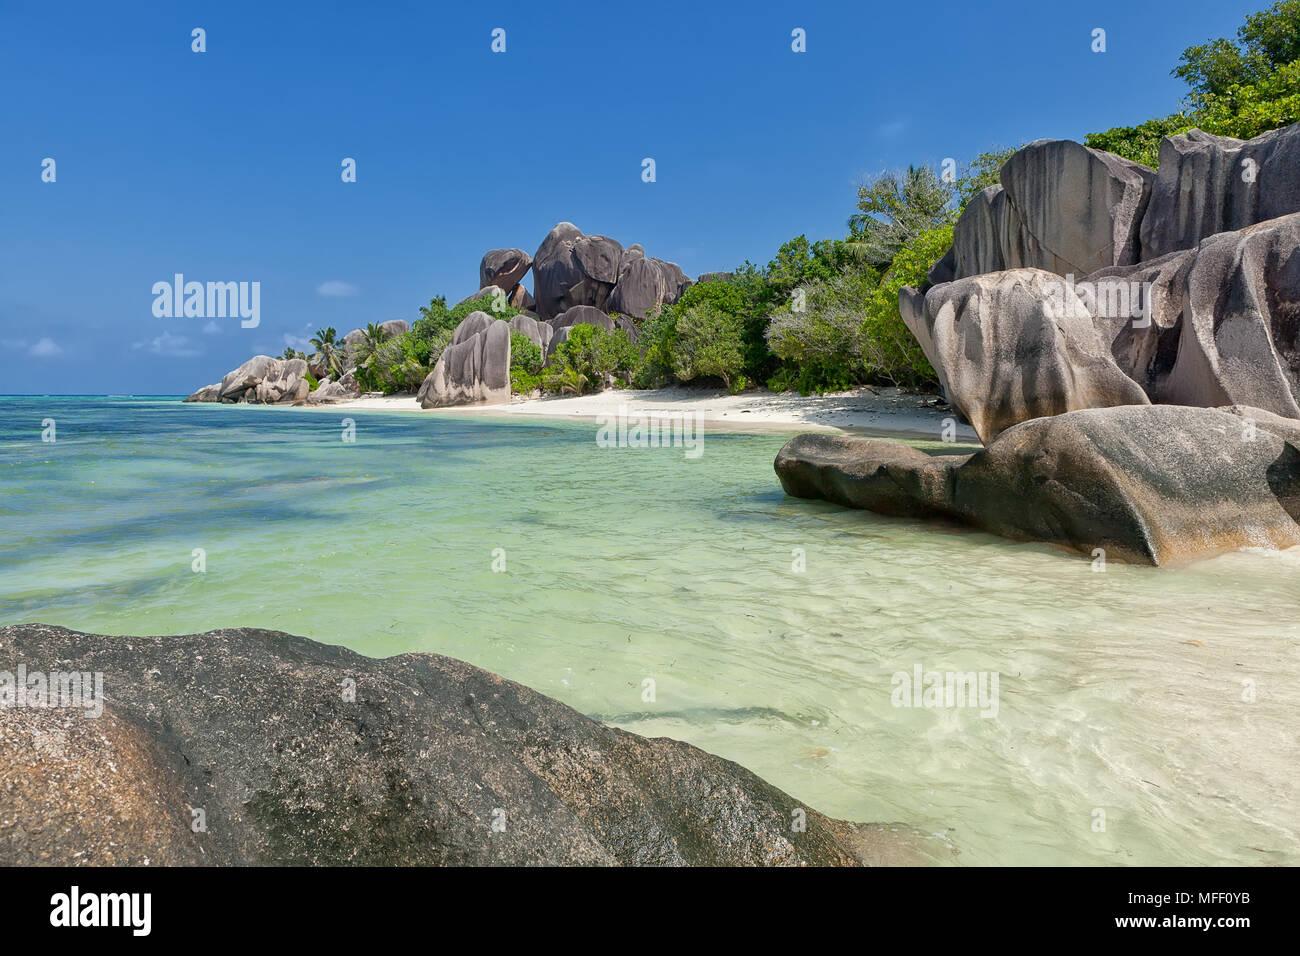 Anse Source d'Argent - rocas de granito en la hermosa playa de isla tropical en Seychelles La Digue Imagen De Stock